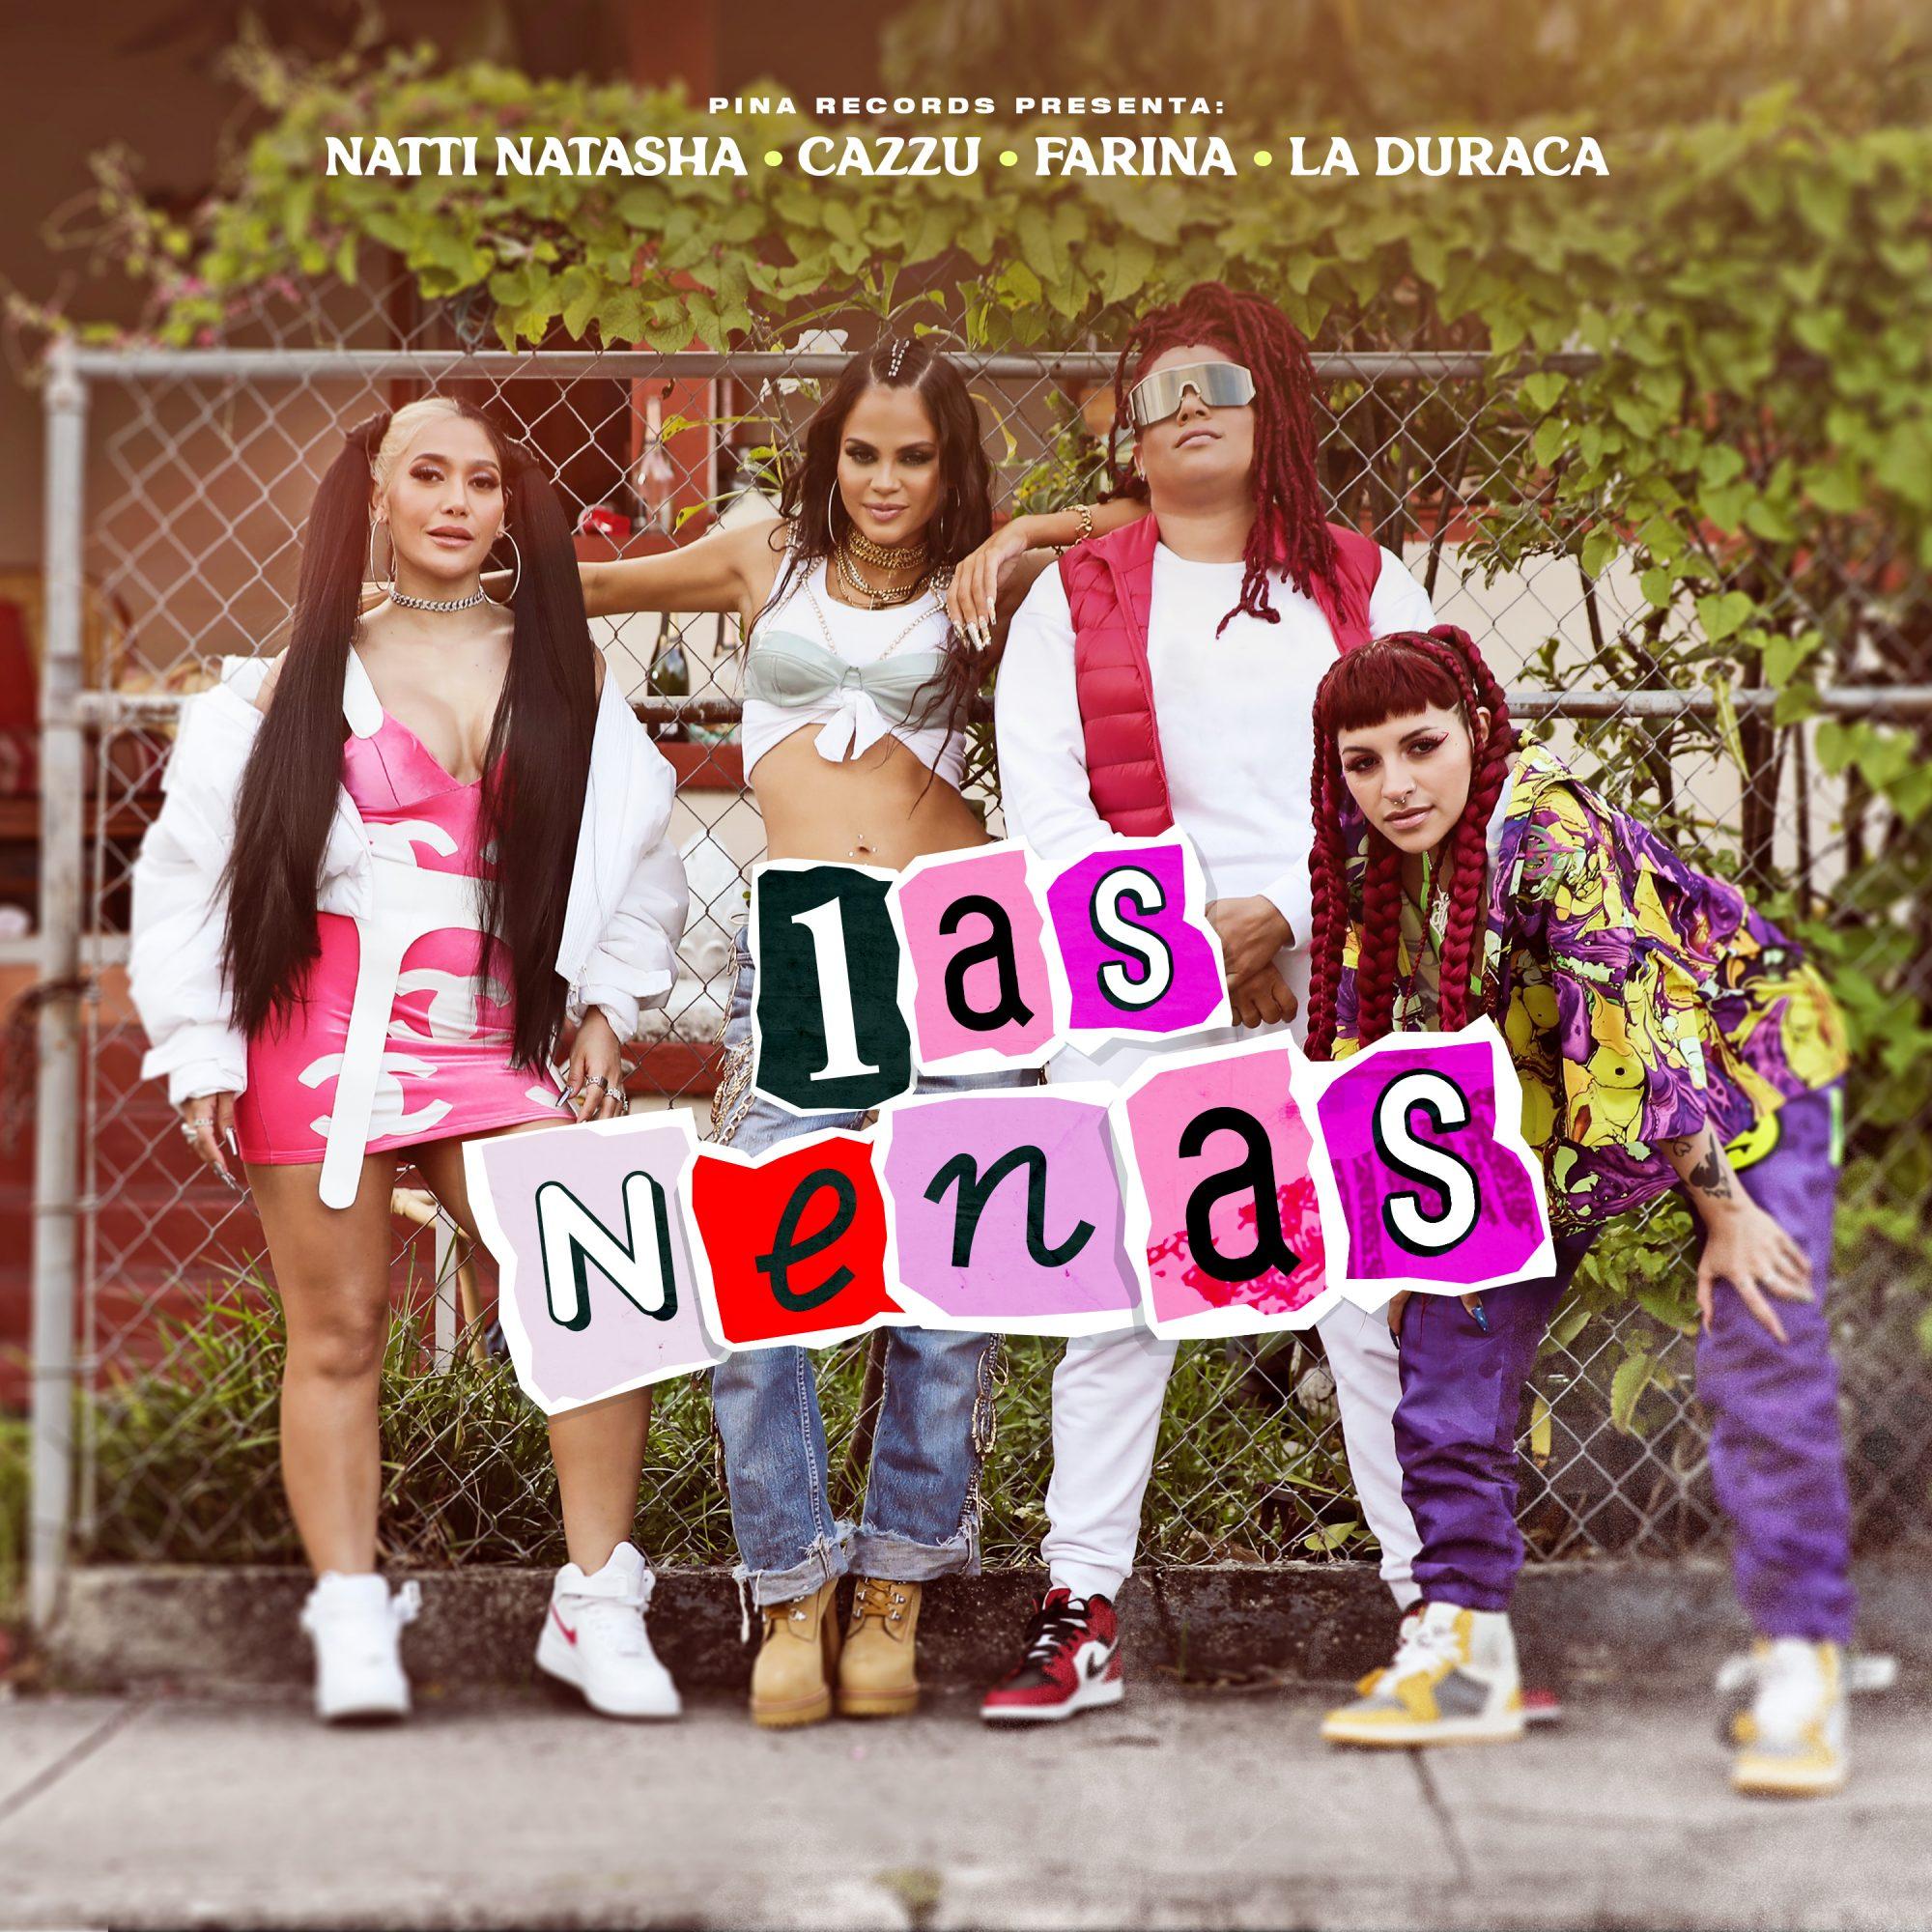 Natti Natasha, Cazzu, Farina y La Duraca